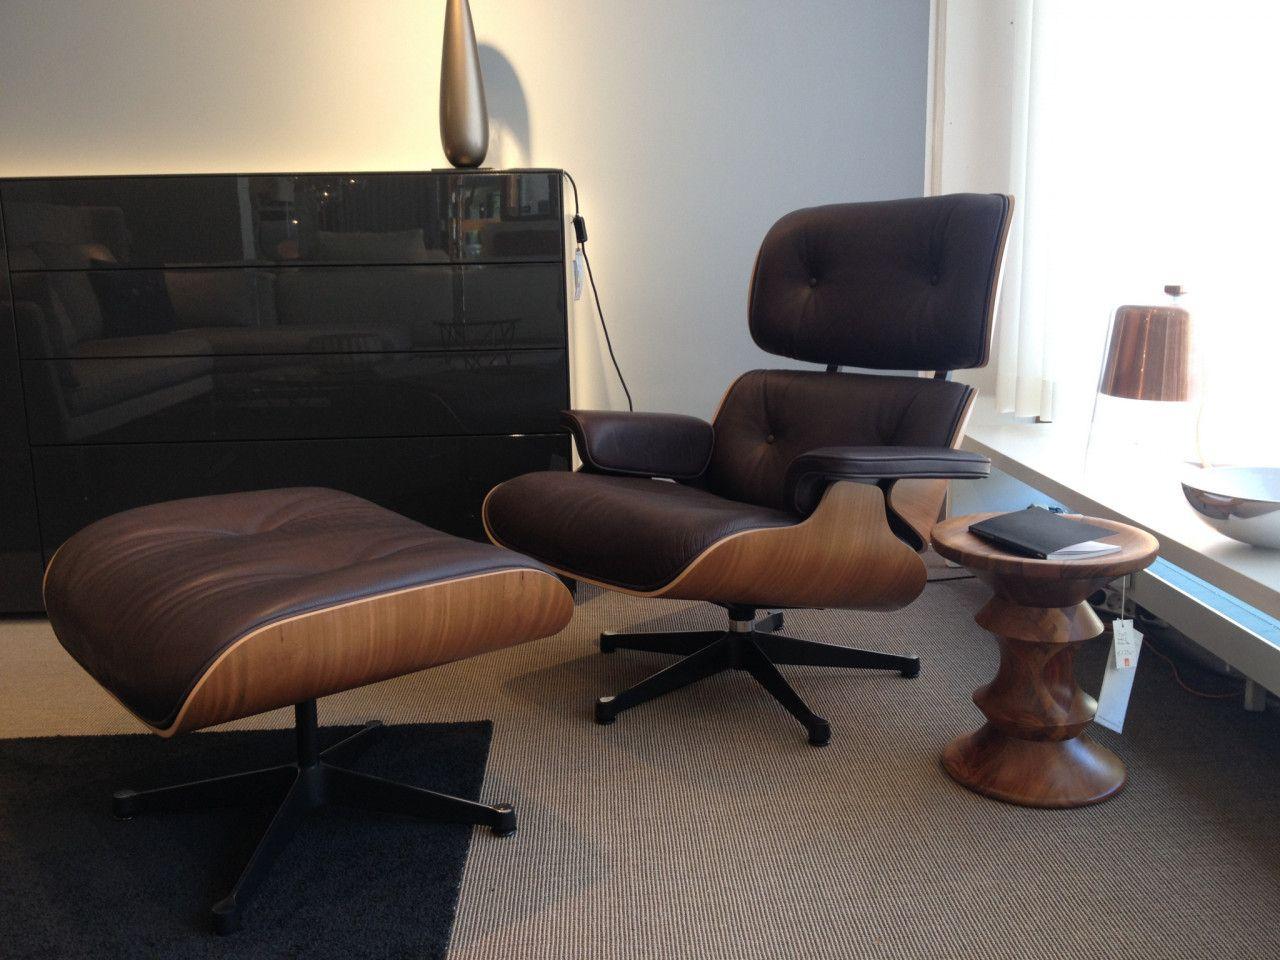 Designklassiker lounge chair von vitra in braunem leder